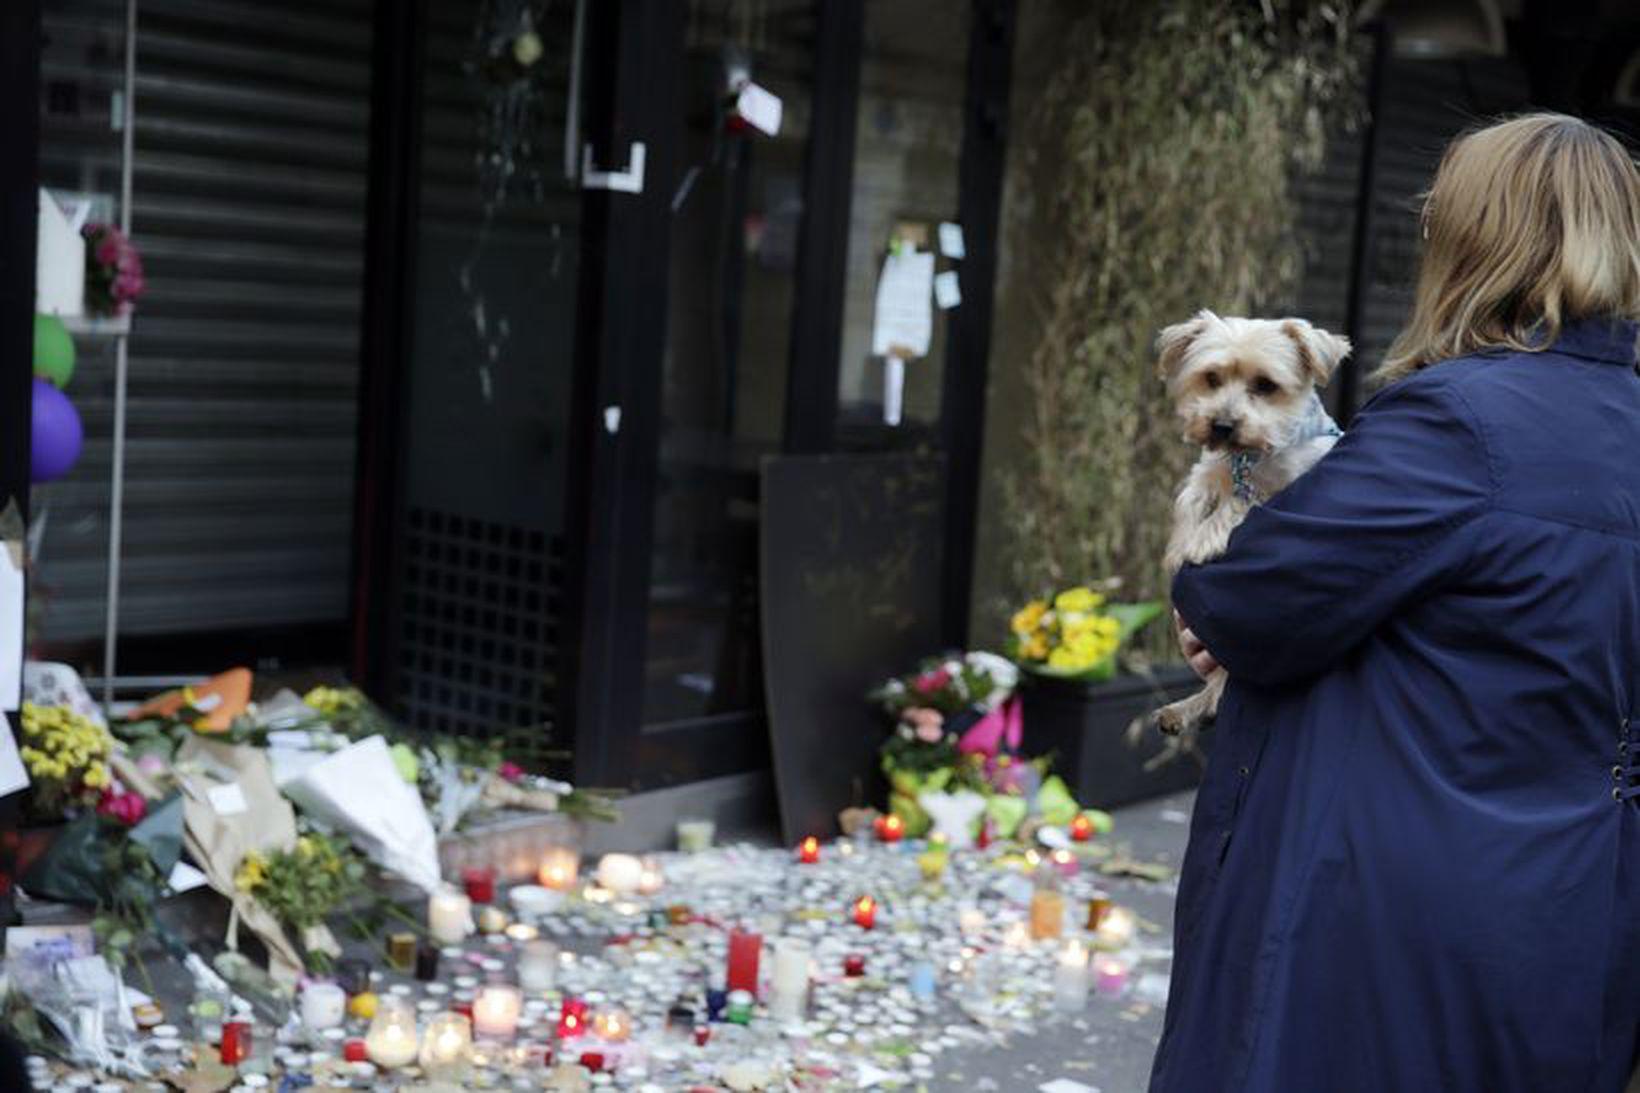 Kona við japanska veitingastaðinn La Belle Equipe', Rue de Charonne, …